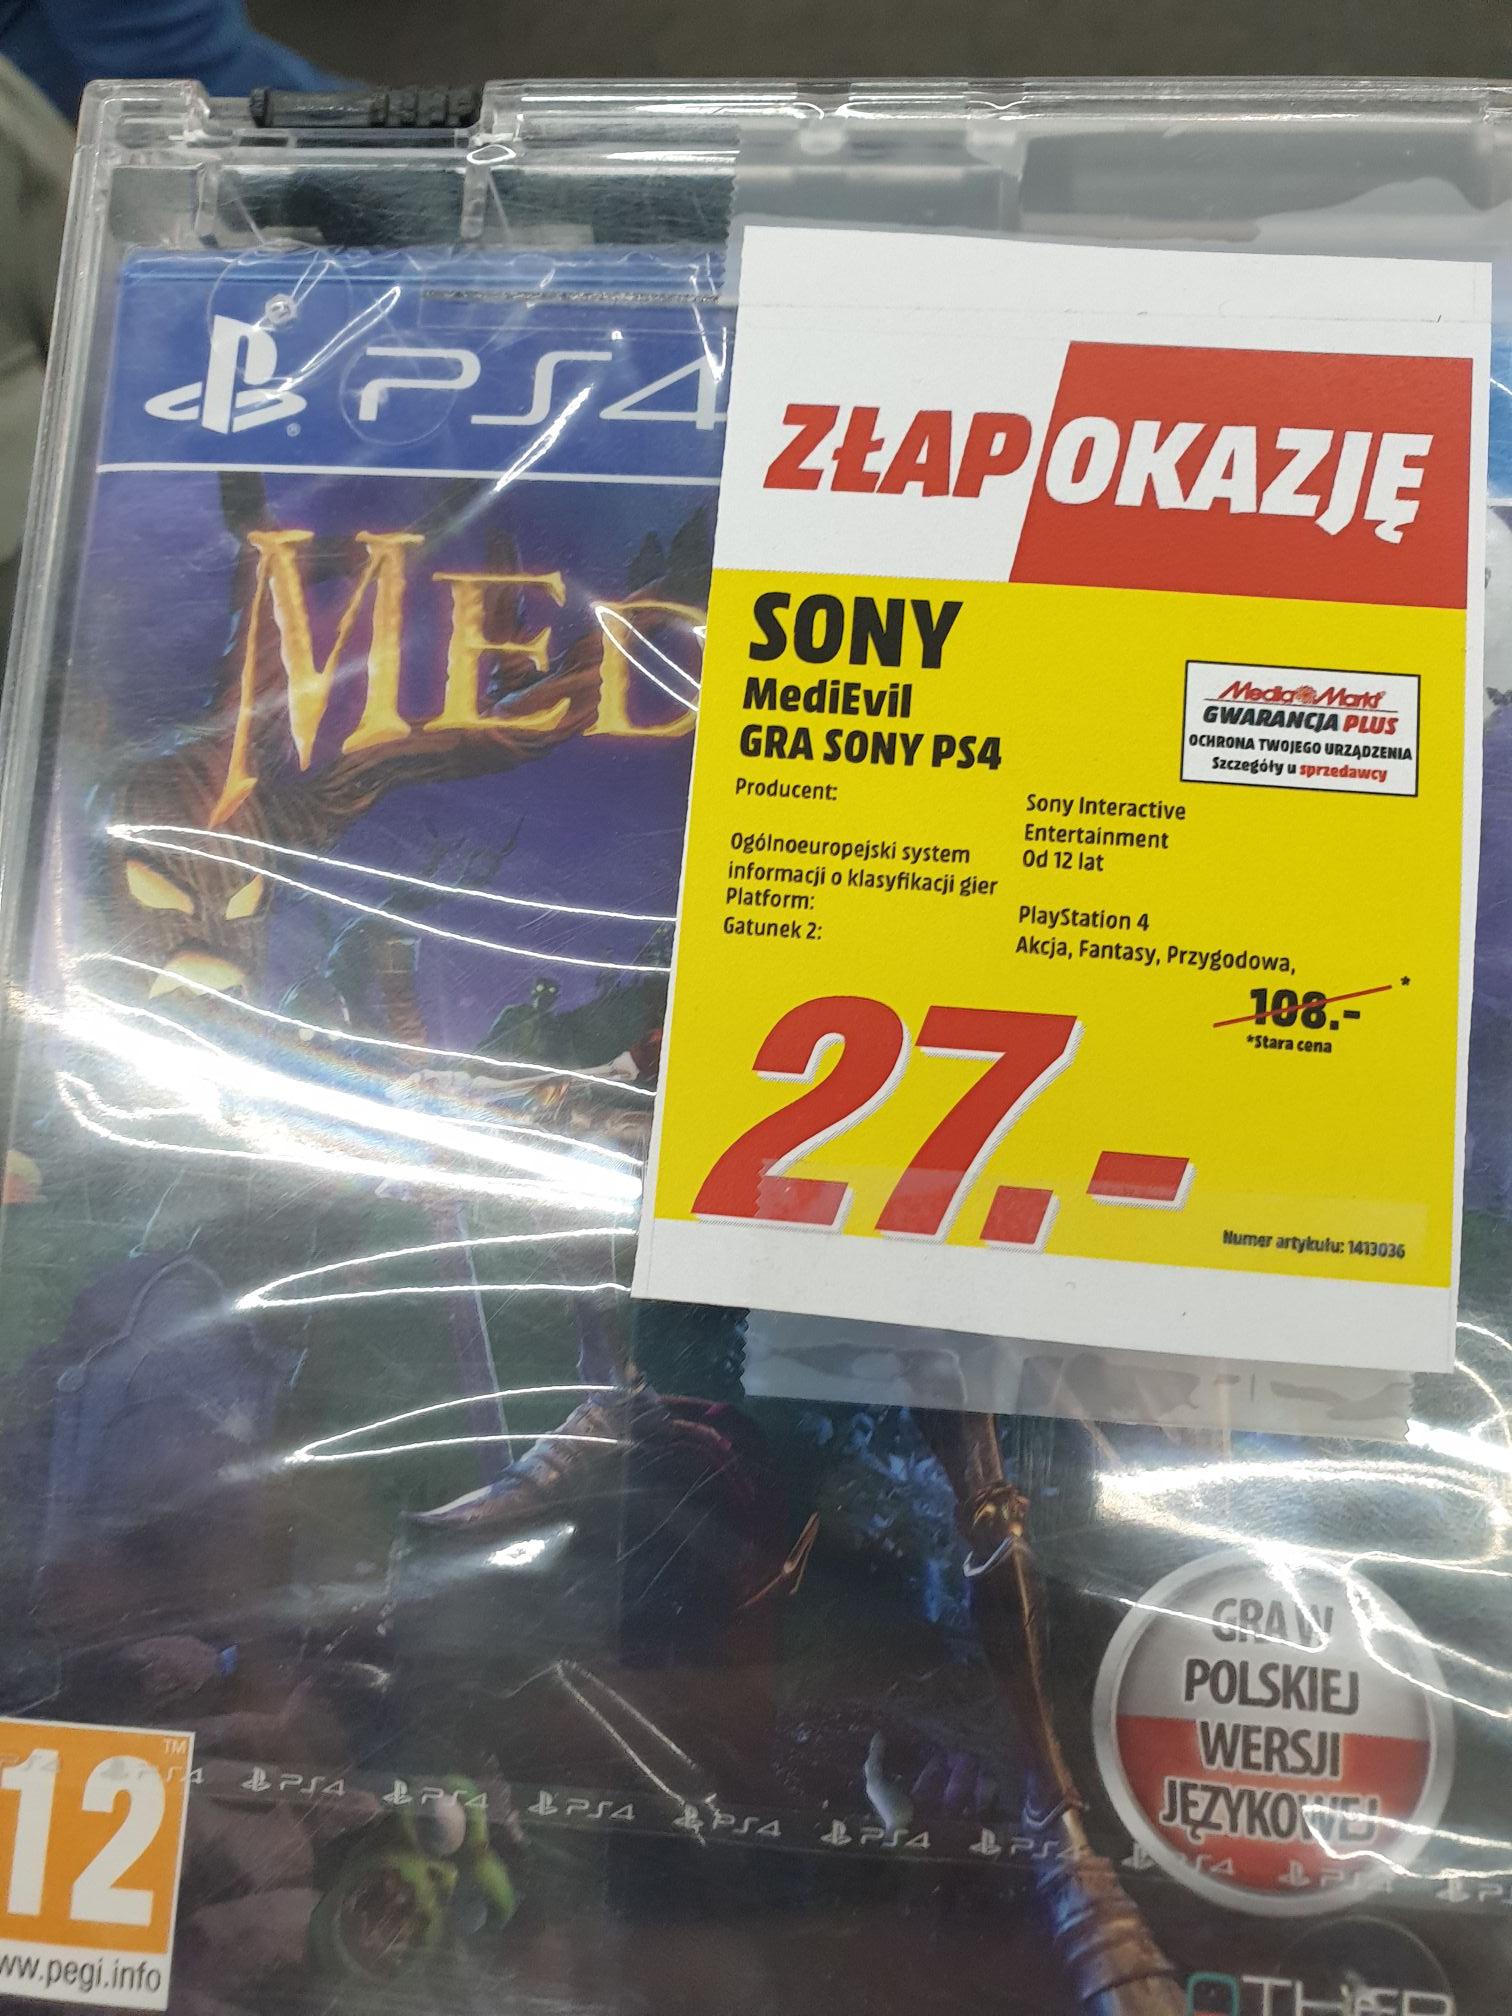 MediEvil PS4 w MediaMarkt Targowek